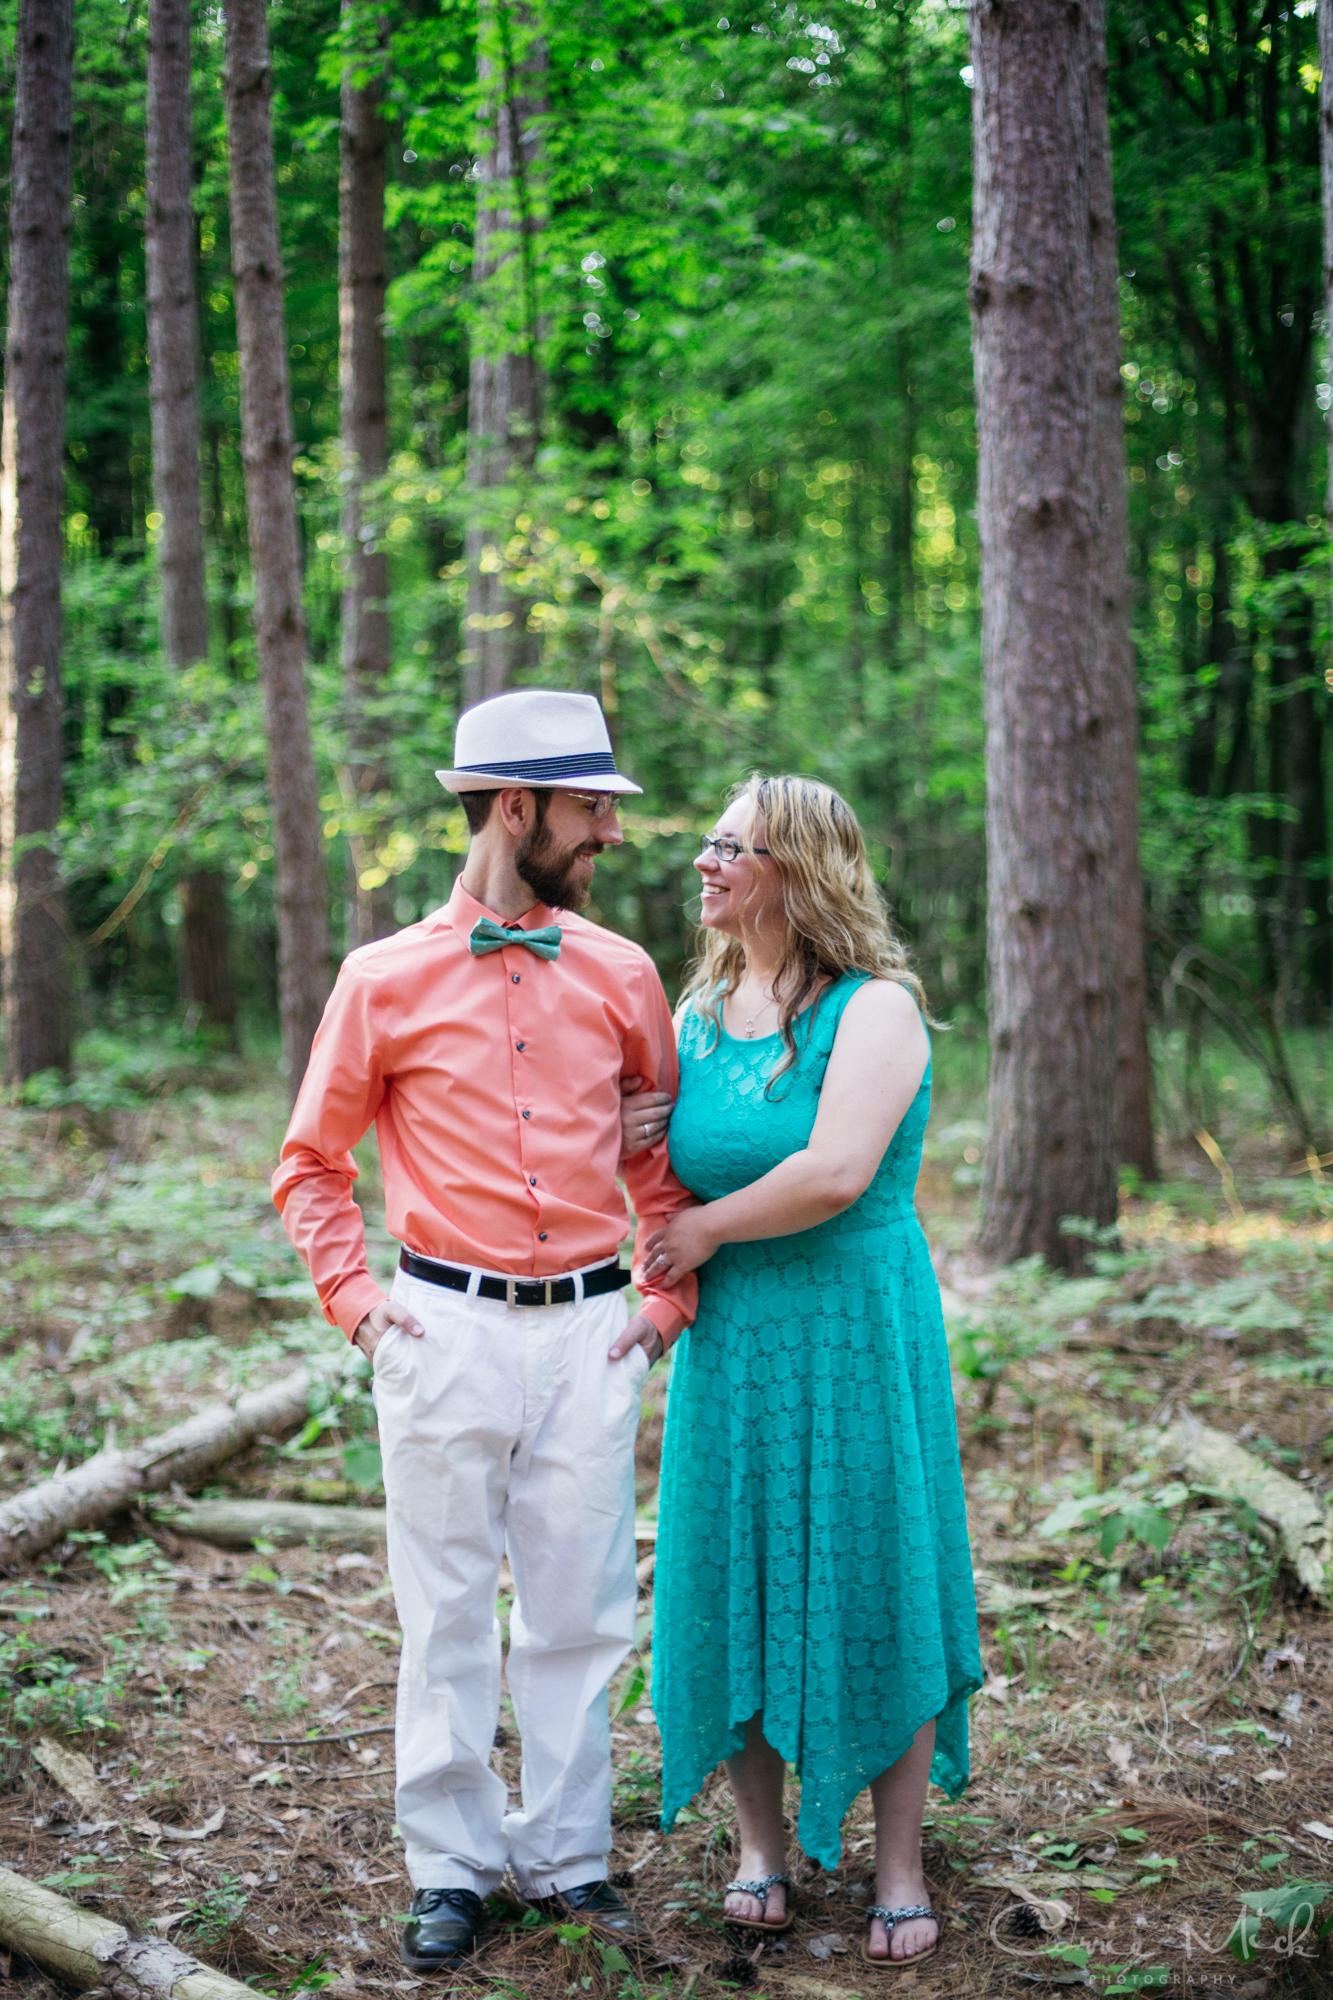 Oak Openings MetroPark Ohio - Peter and Rachel Engaged - Corrie Mick Photography-5.jpg